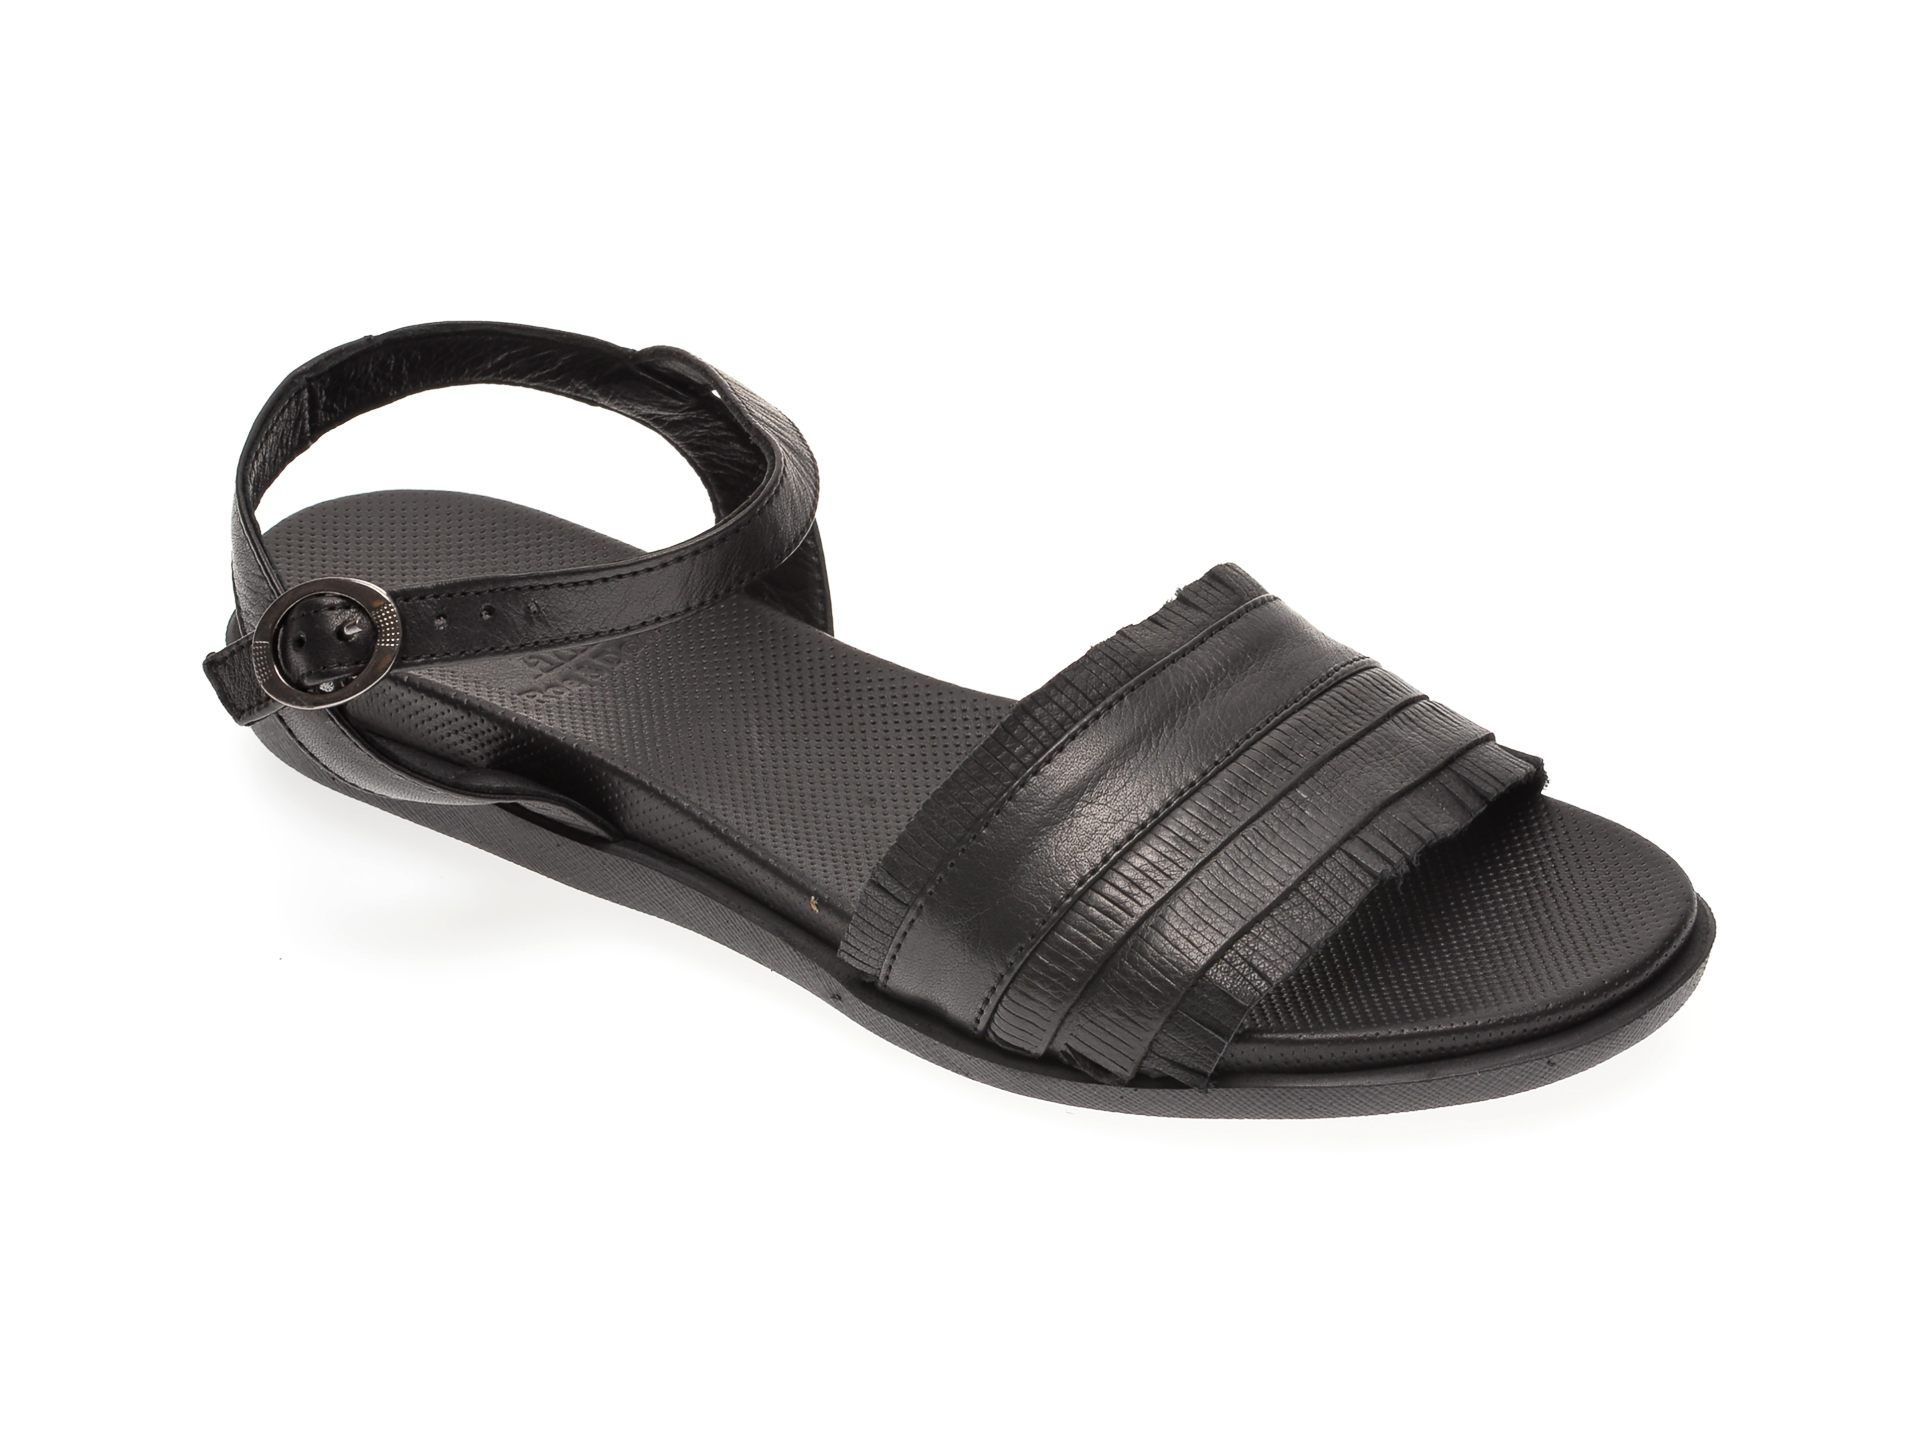 Sandale BABOOS negre, 1408, din piele naturala